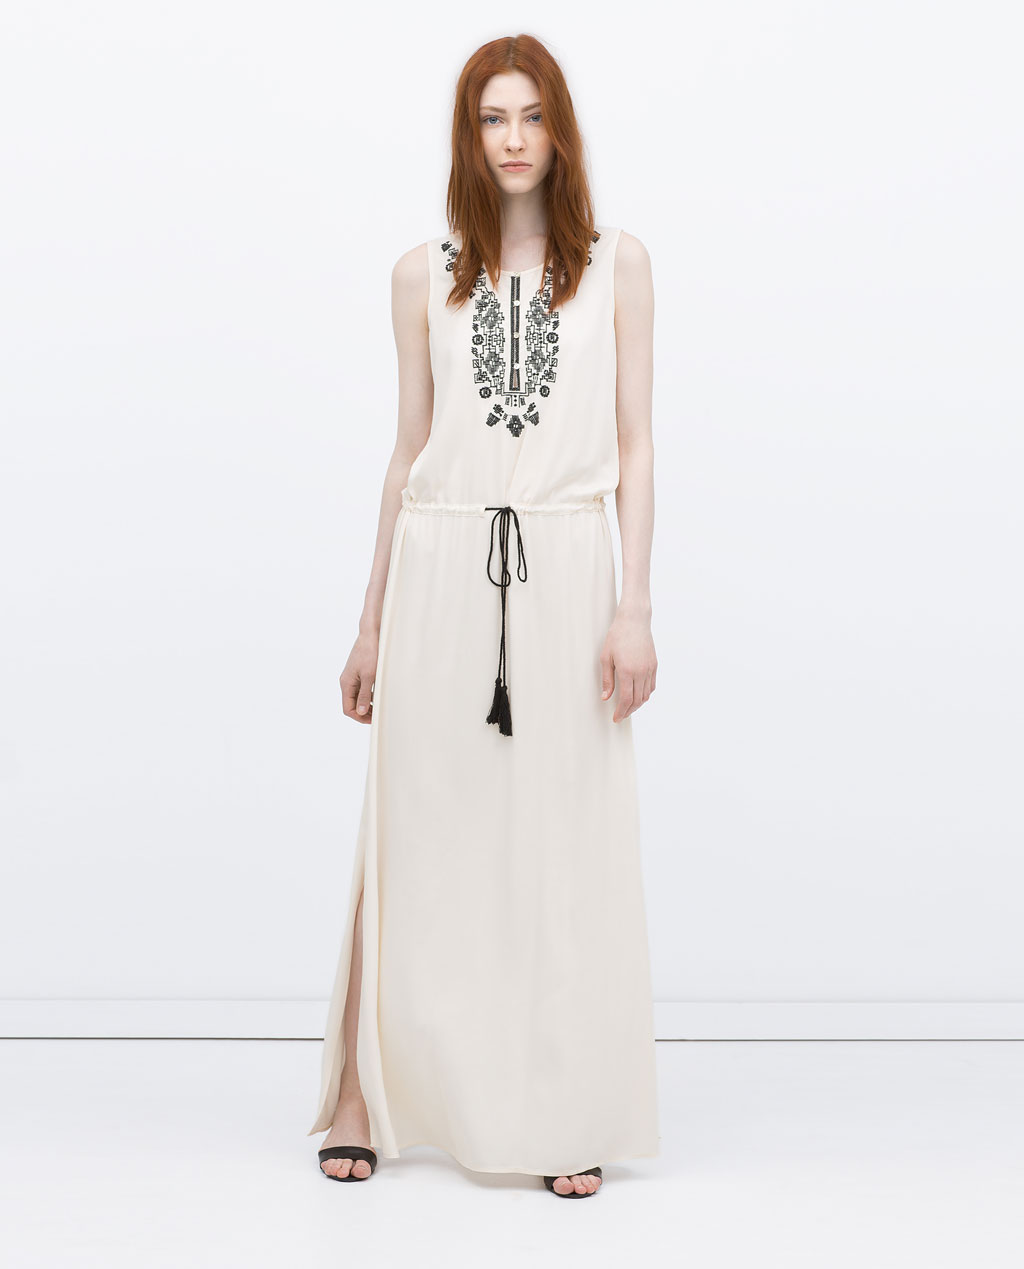 f508d1e69644b Zara woman robe longue – Site de mode populaire